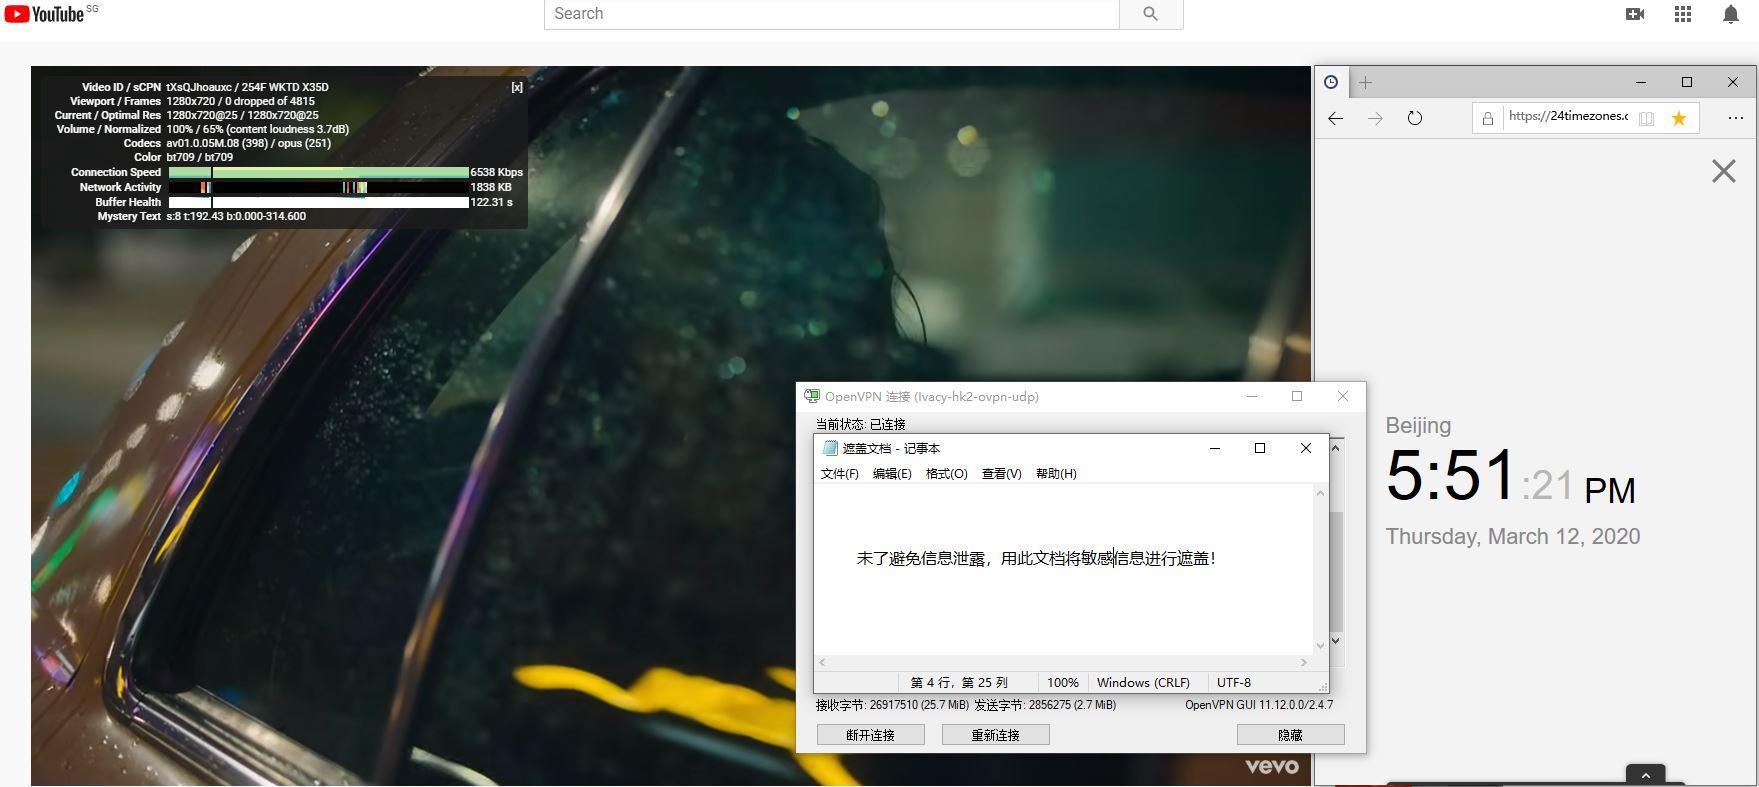 Windows10 IvacyVPN OpenVPN HK-2 中国VPN翻墙 科学上网 Youtube测速 - 20200312